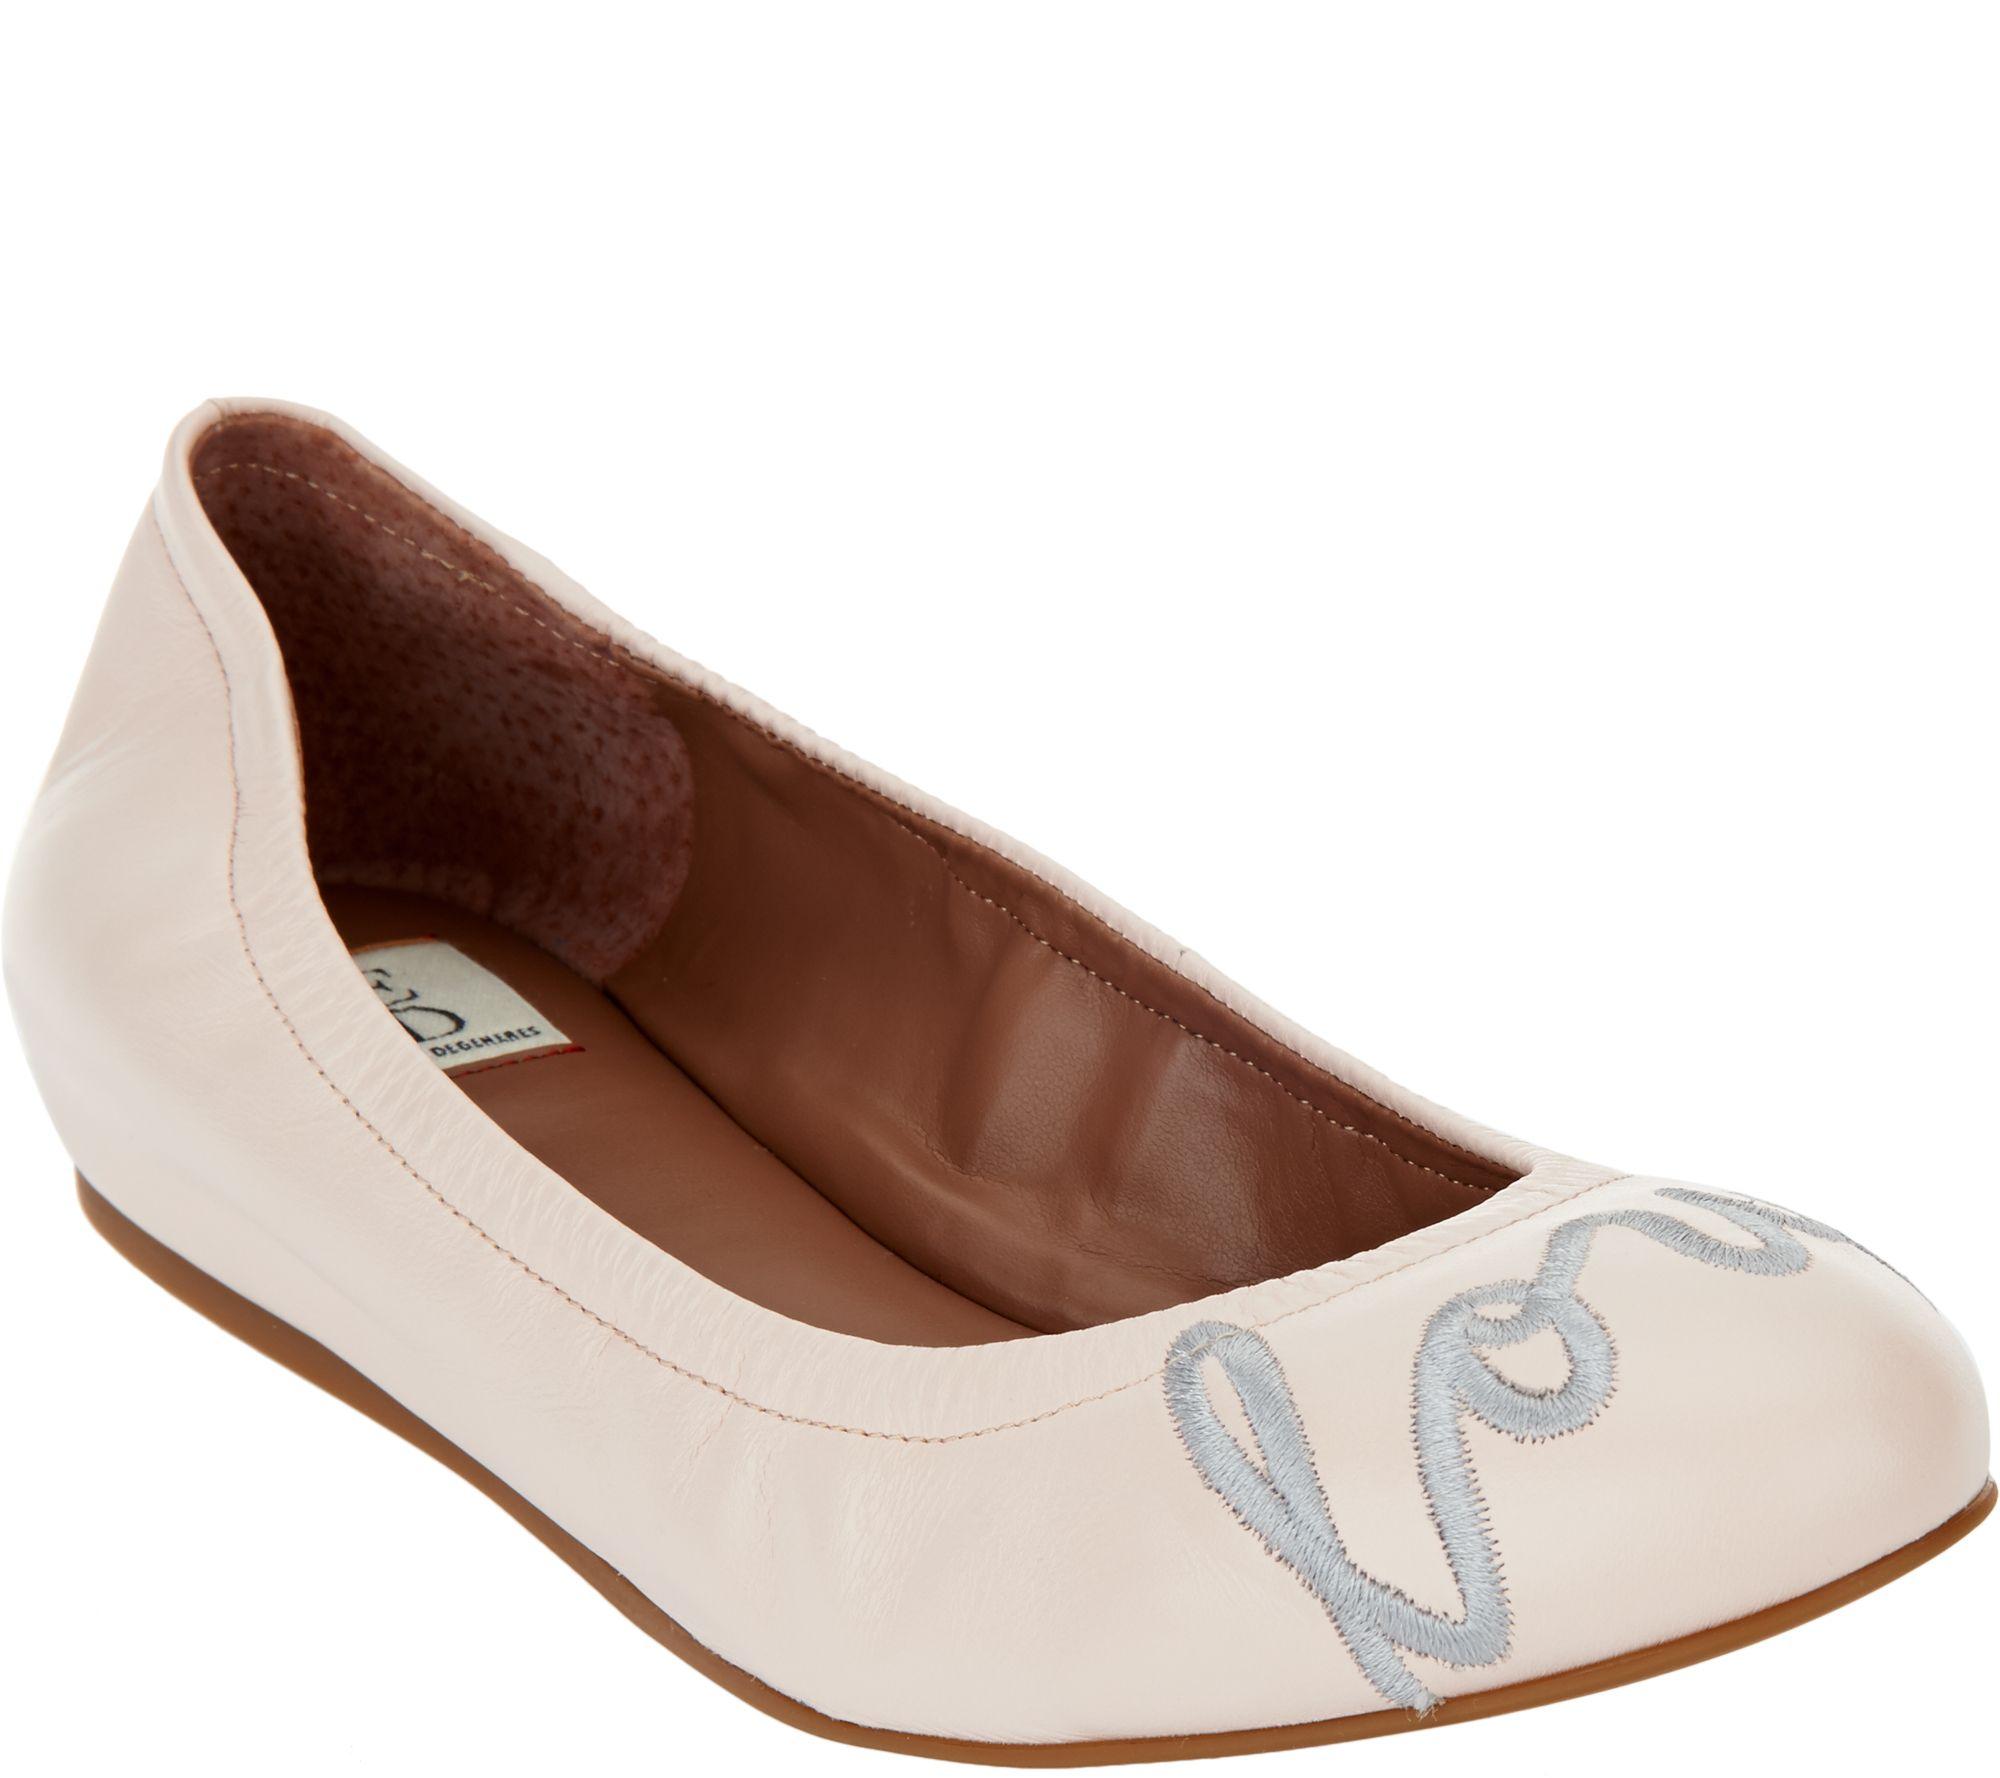 foam ladies ella memory shoes amazon mesh go uk flexi bags dp comforter pumps size trainers ballet comfortable flats on co comfort slip